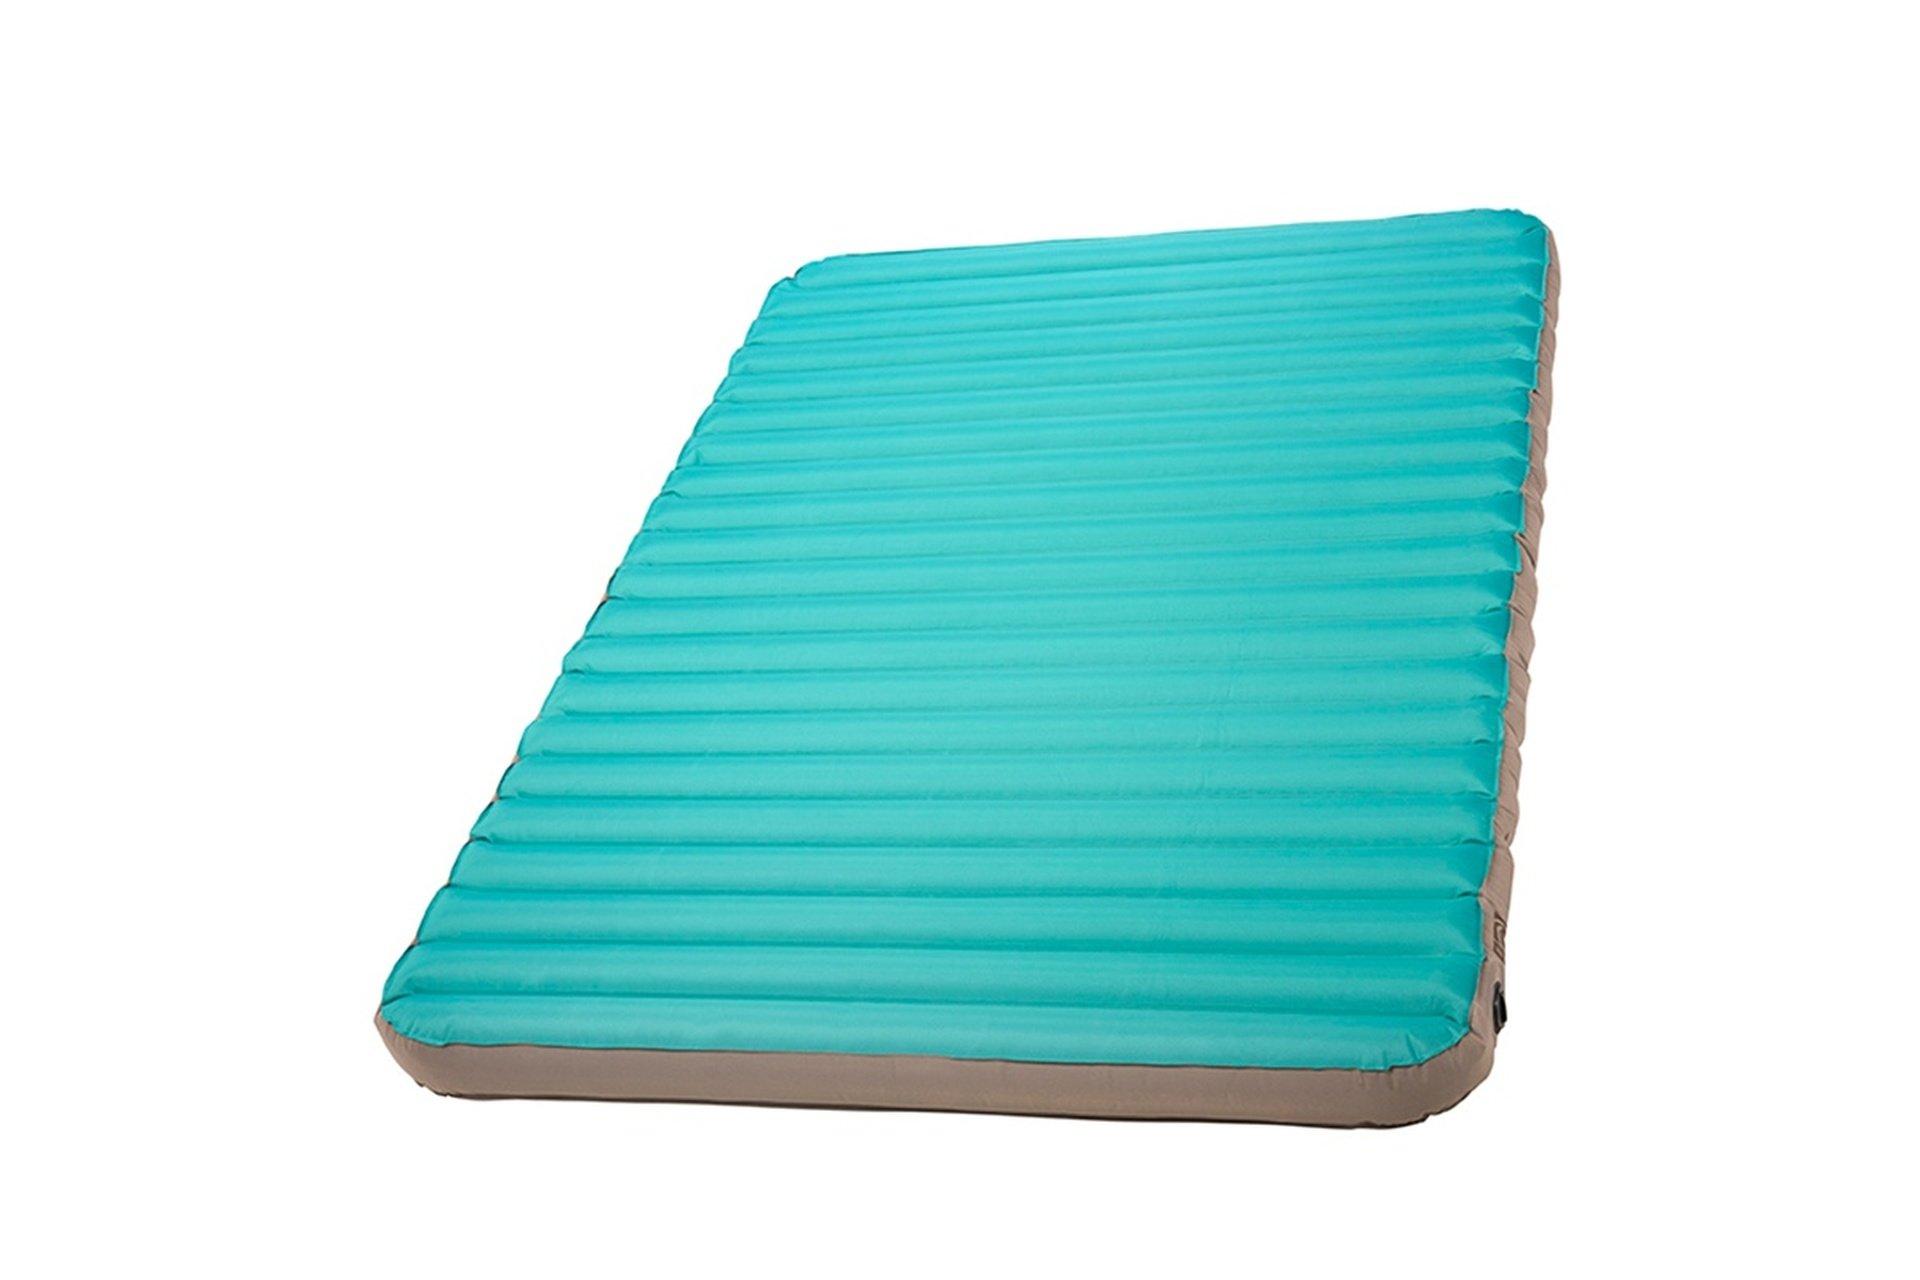 Kelty Tru.Comfort Camp Bed Air Matress